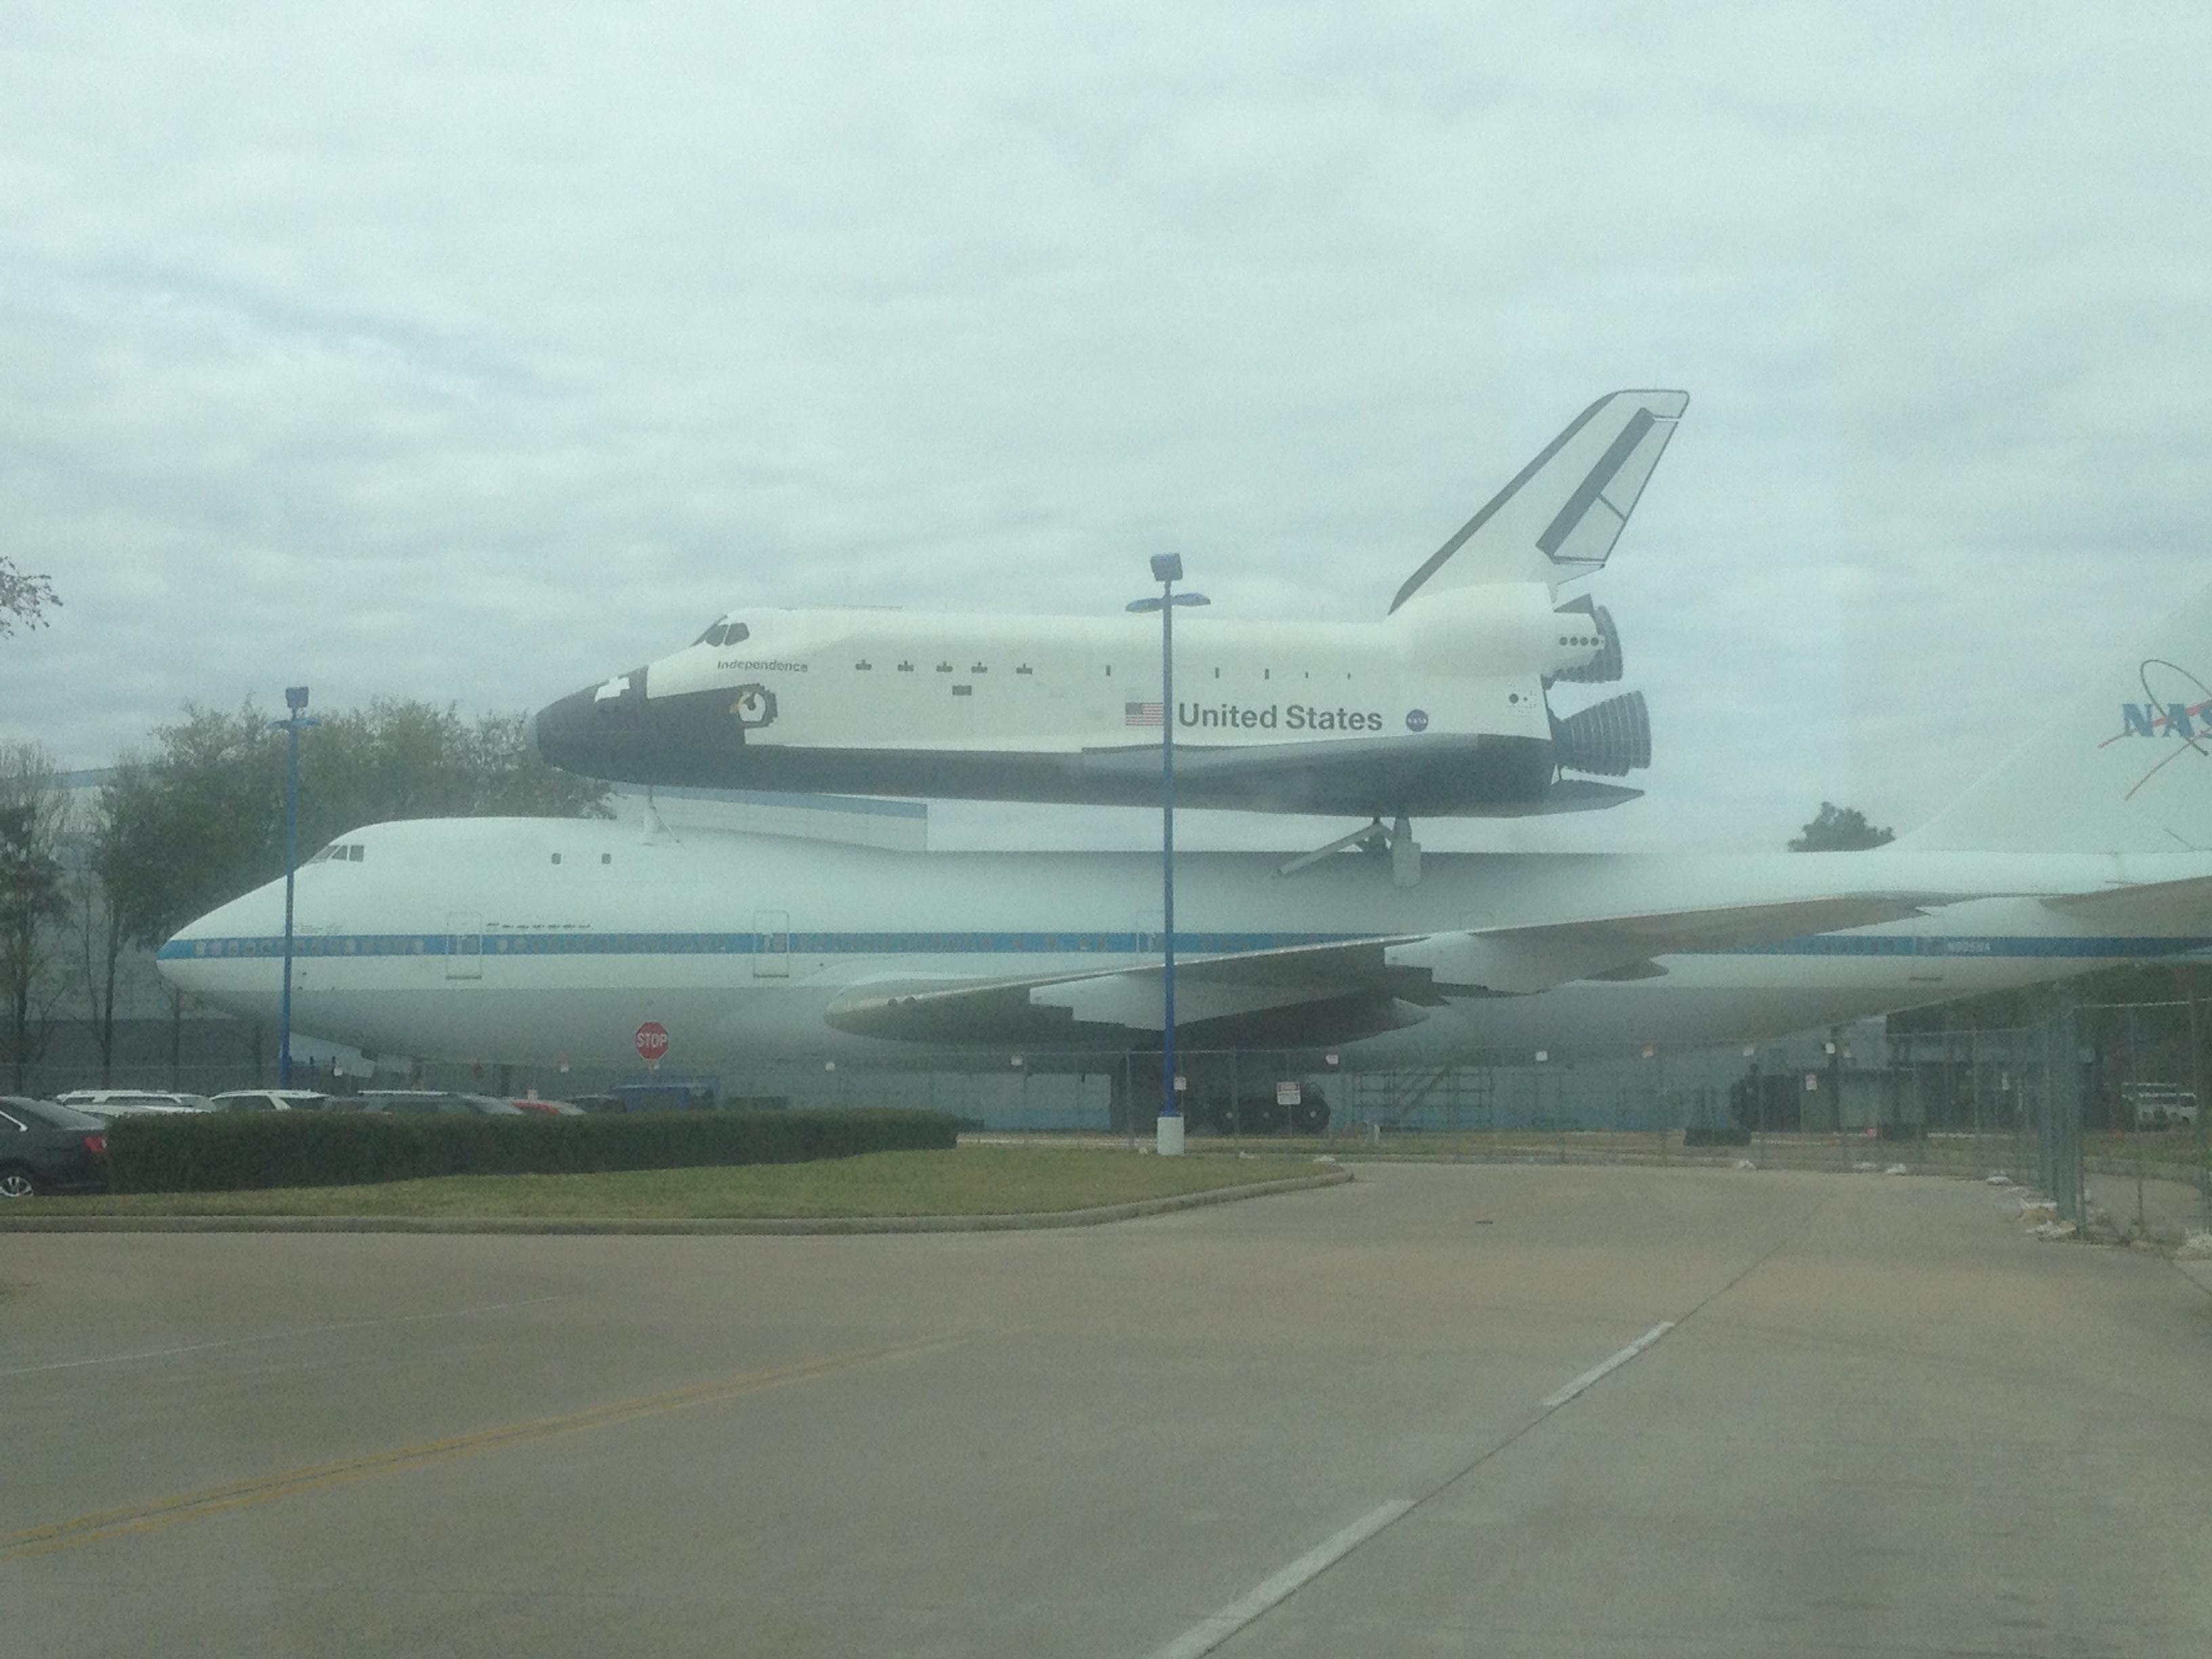 Shuttle and 747 at NASA JSC